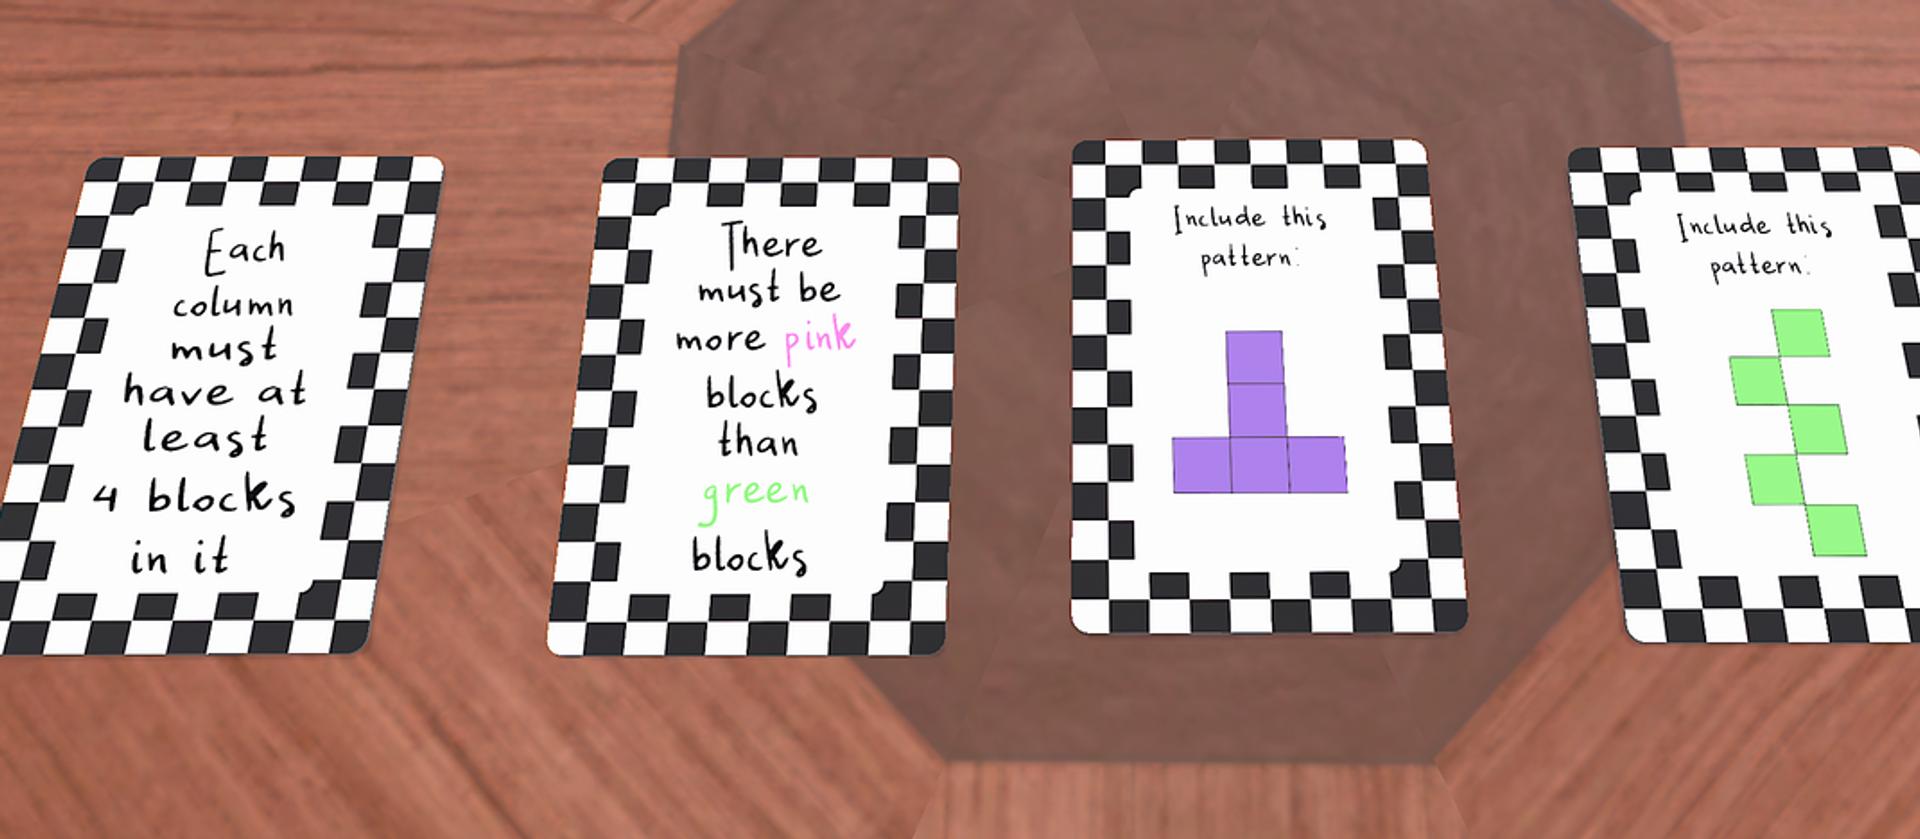 Game Screenshot 3.PNG